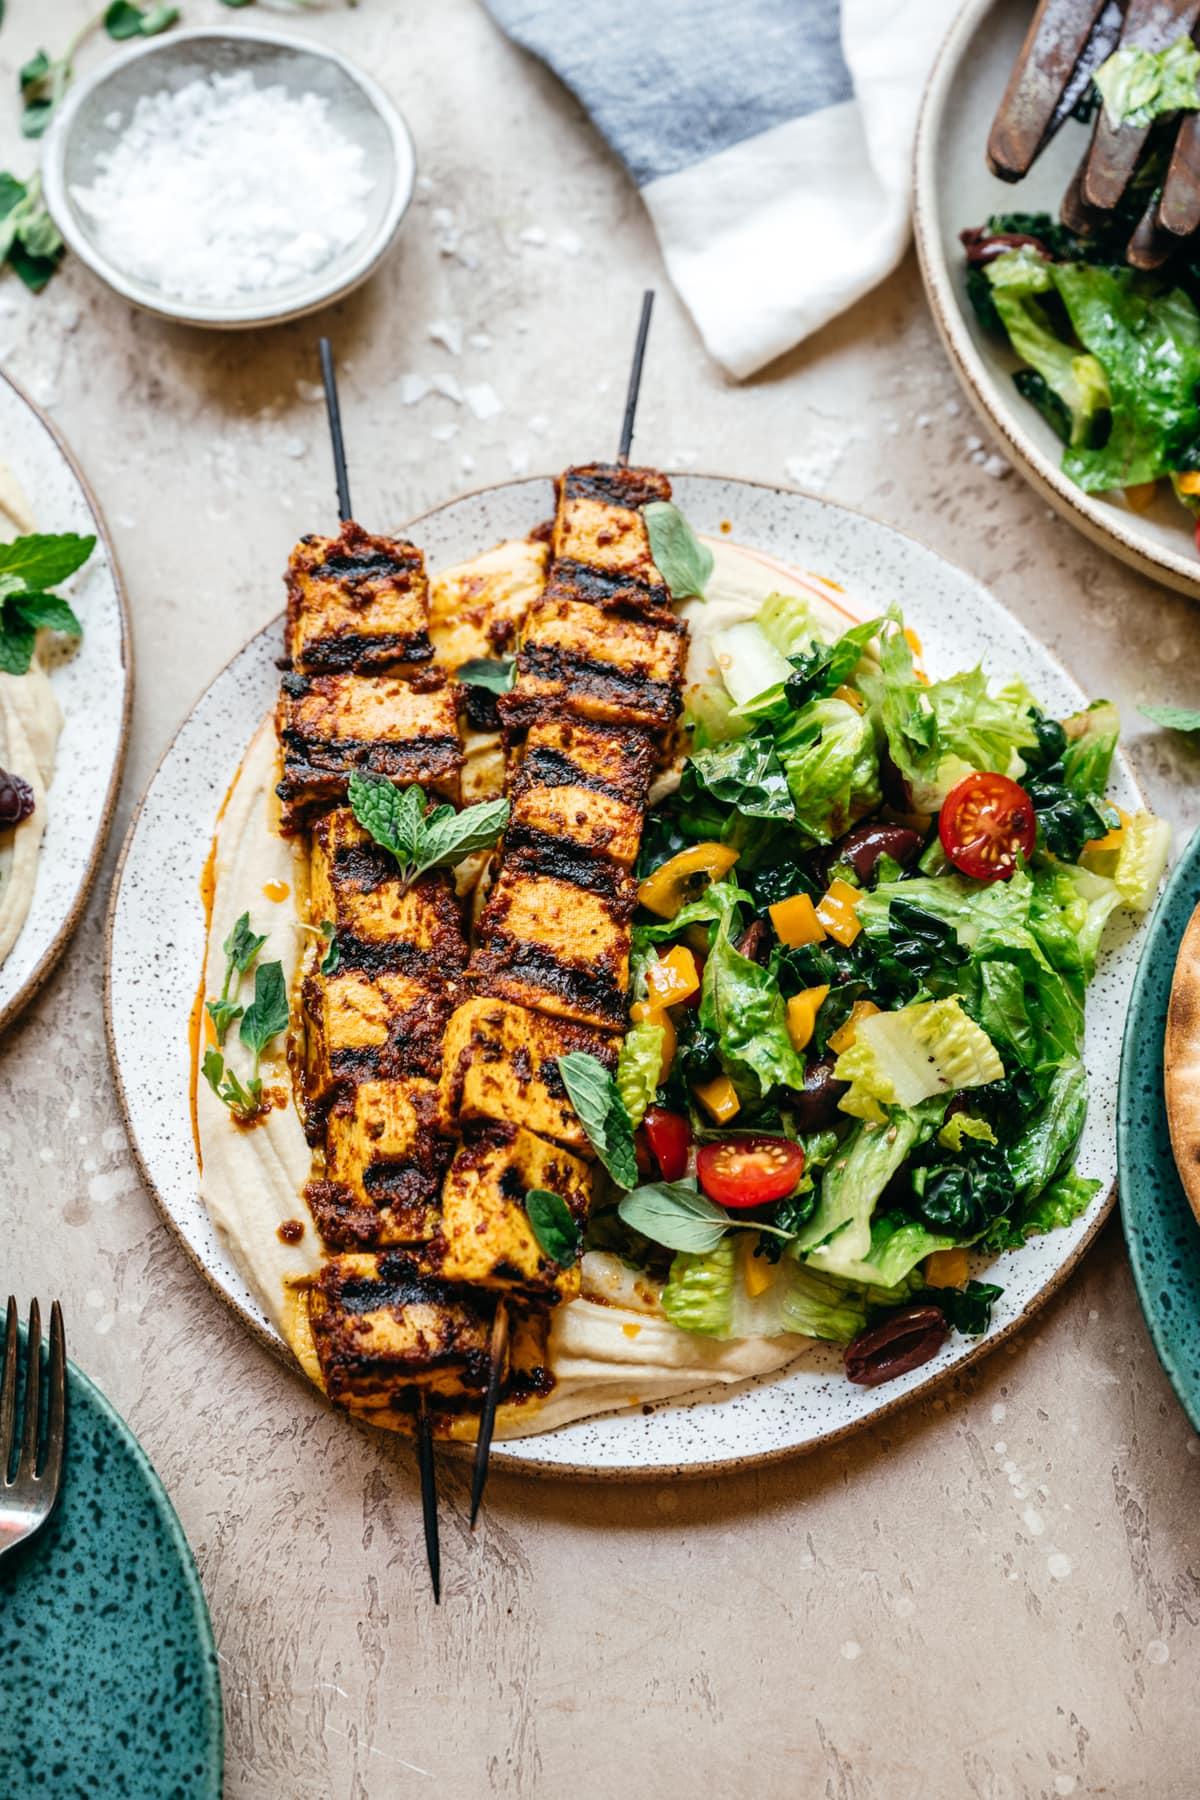 Mediterranean Grilled Tofu